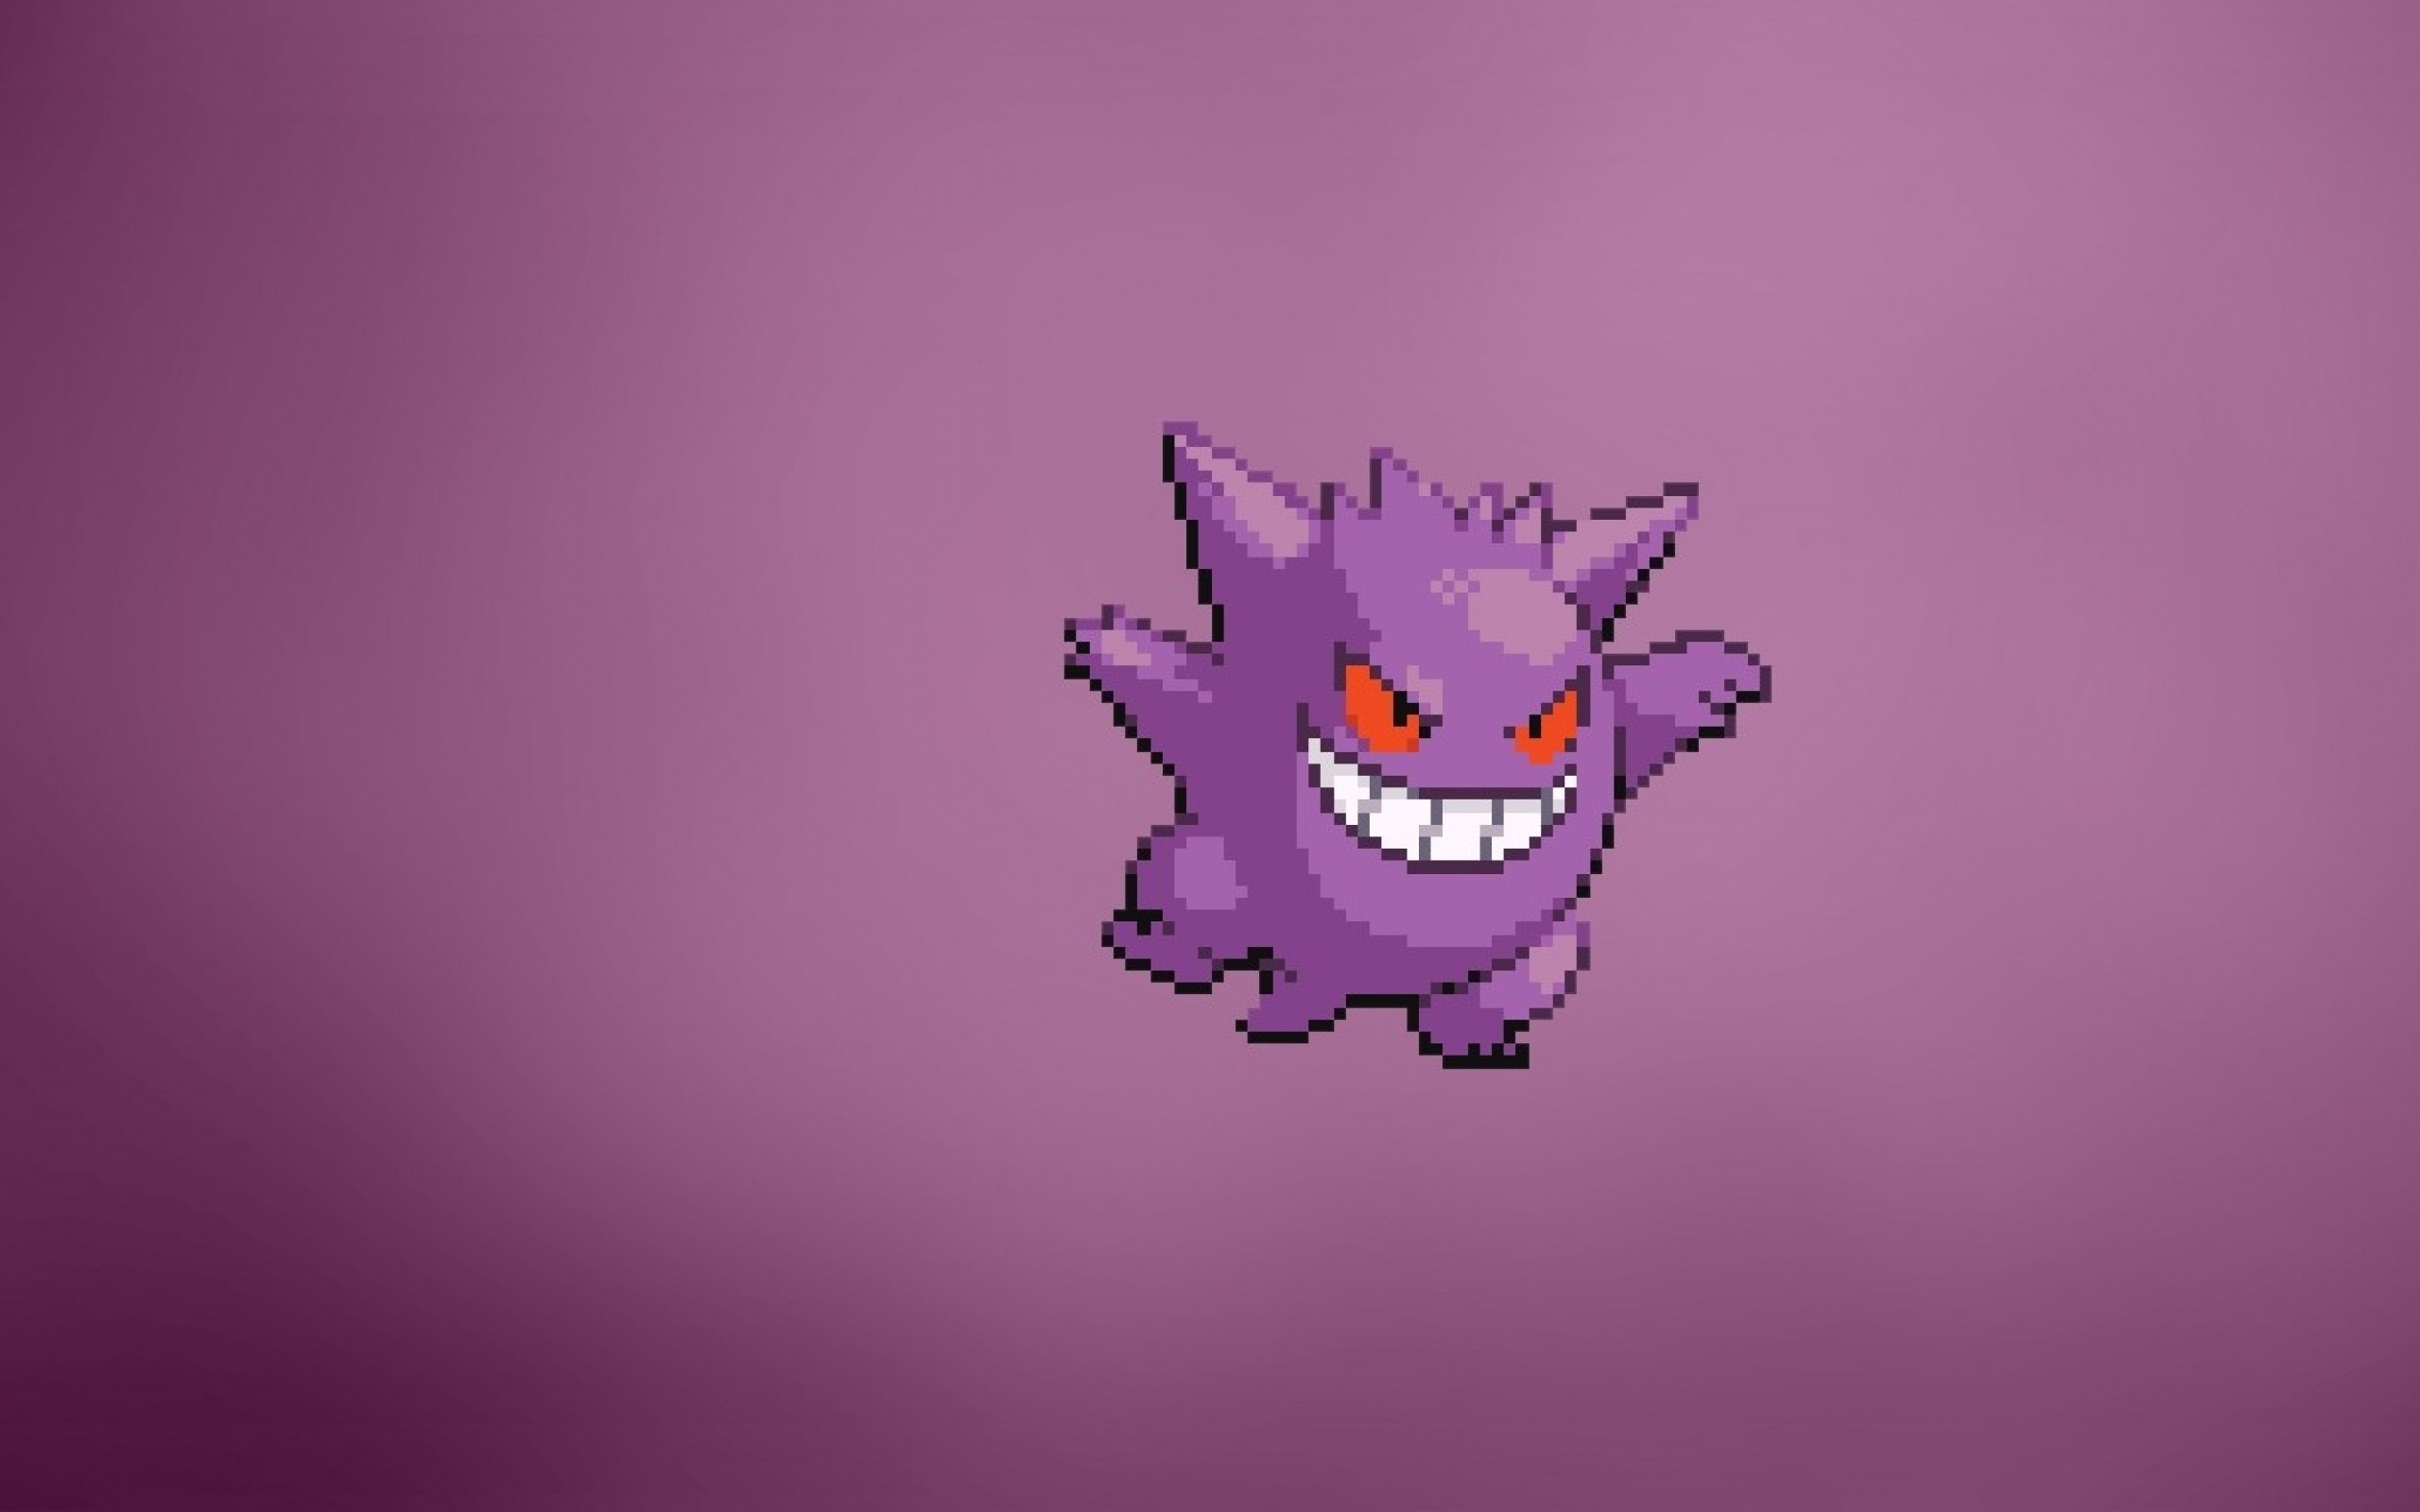 pokemon video games minimalistic purple gengar anime simple background  1366×768 wallpaper Wallpaper HD